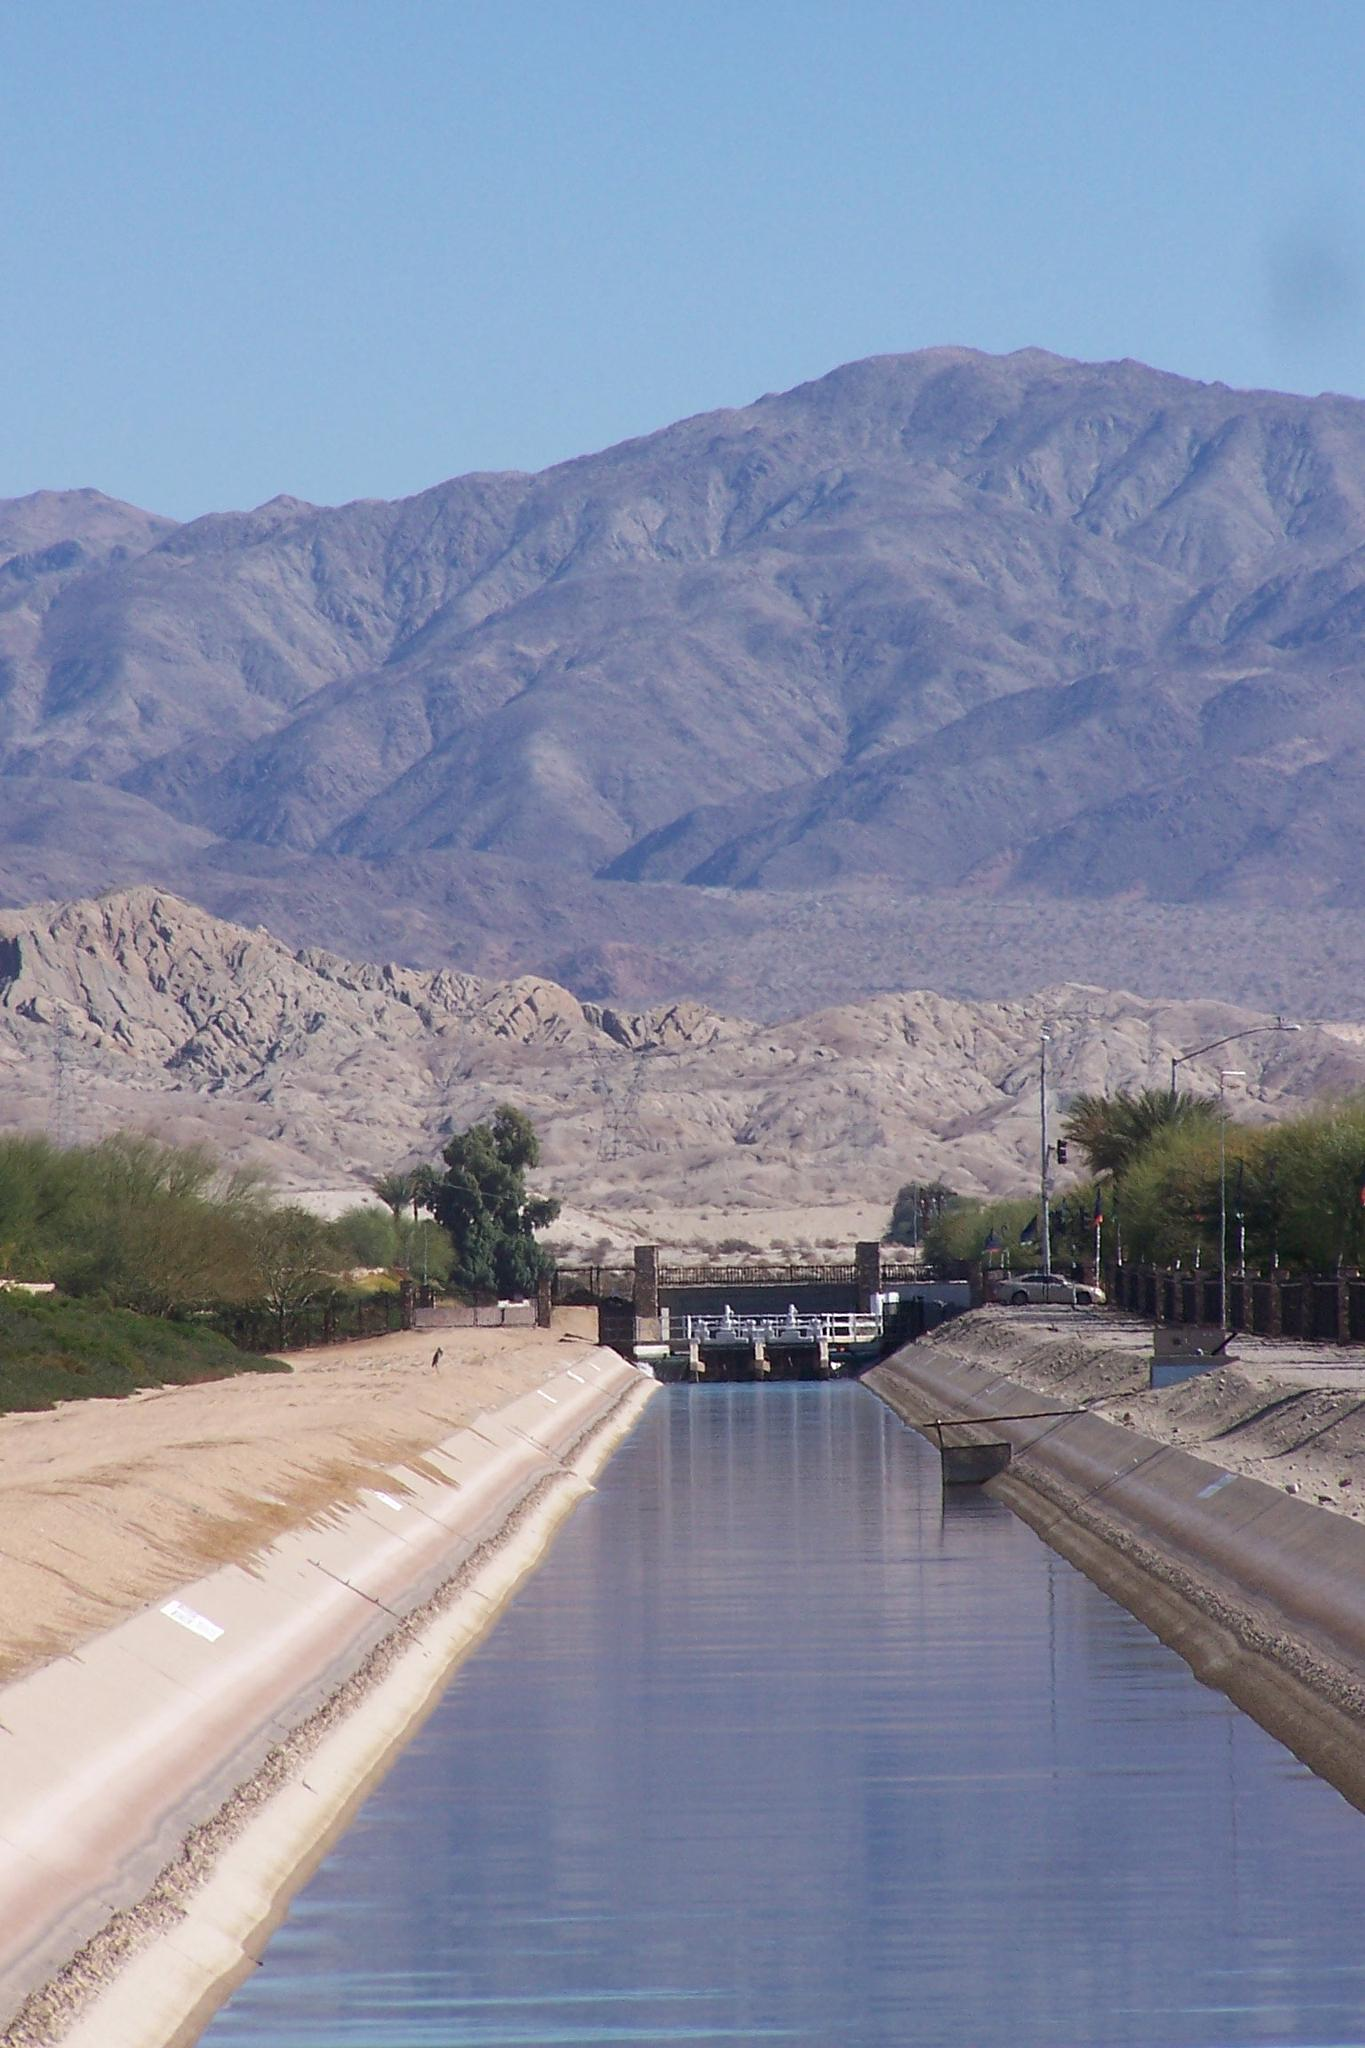 The All-American Canal by ArleenDel